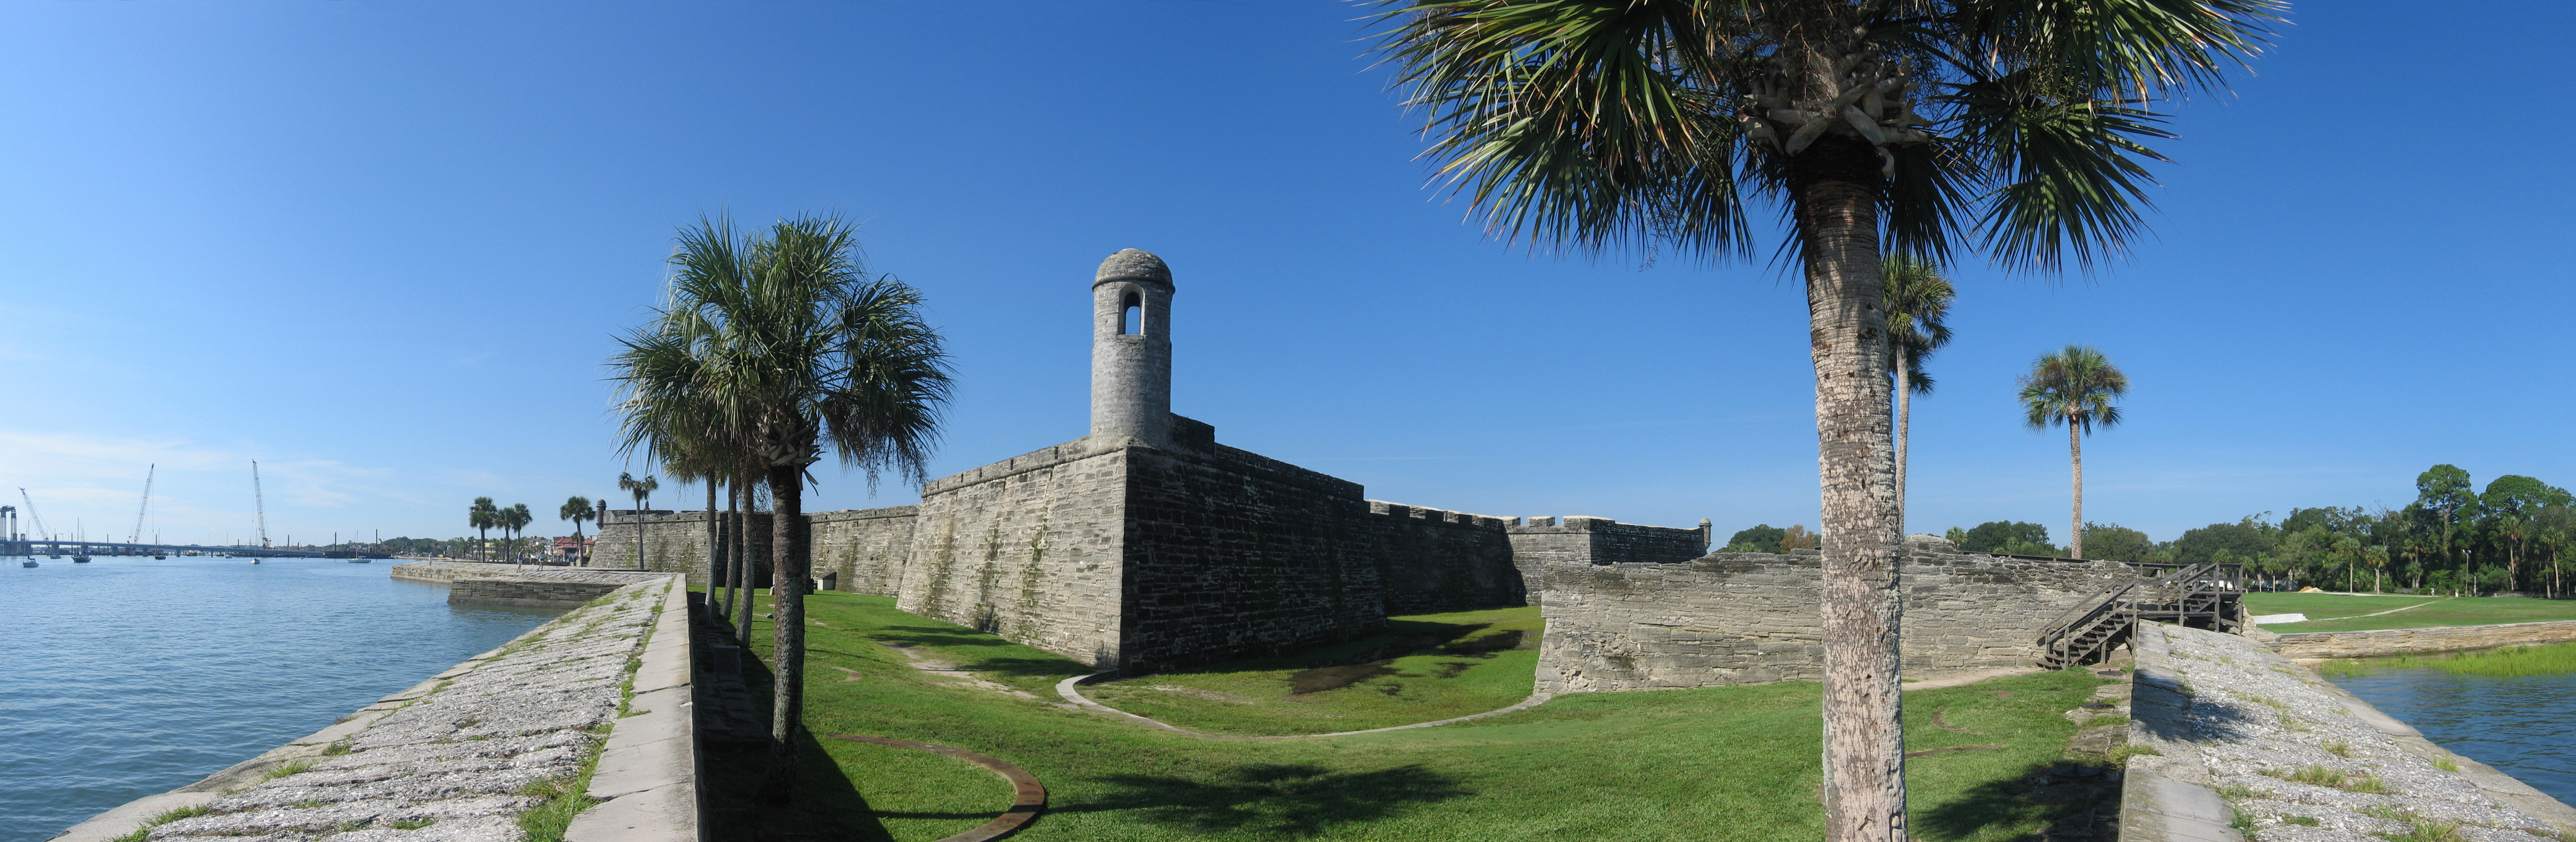 File:Castillo de San Marcos Fort Panorama 3.jpg - Wikimedia Commons